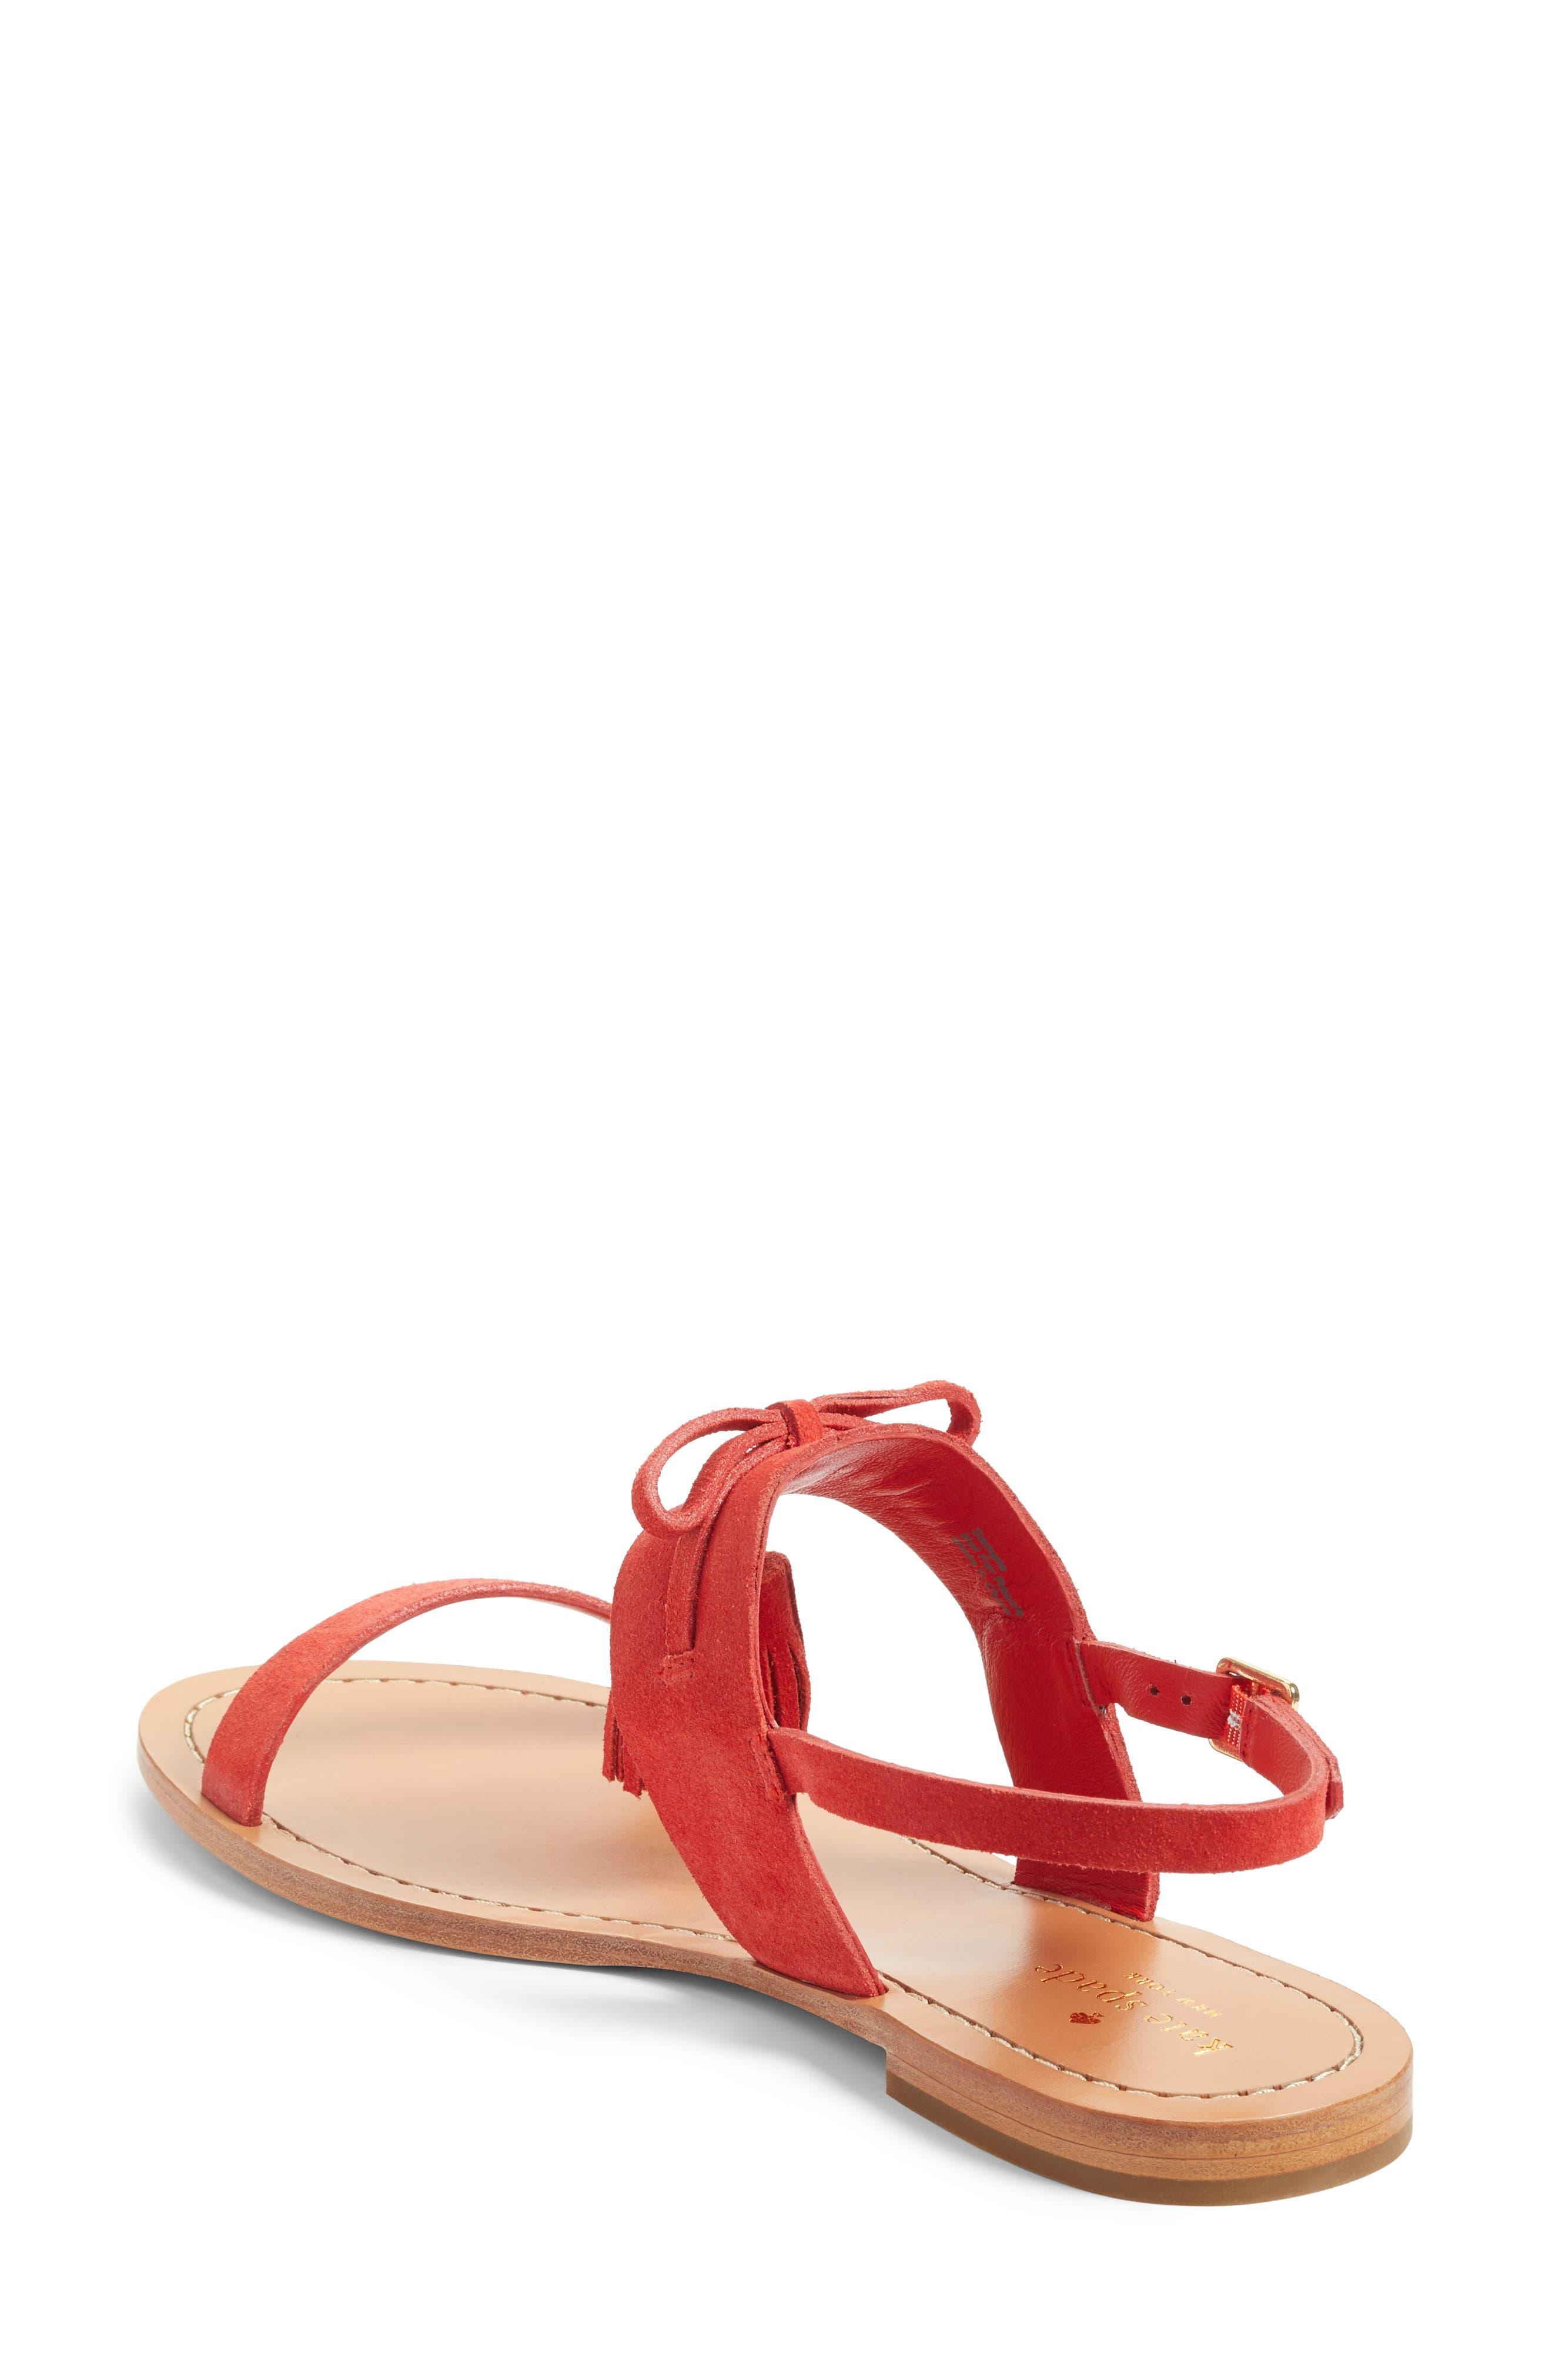 Alternate Image 2  - kate spade new york carlita tassel sandal (Women)